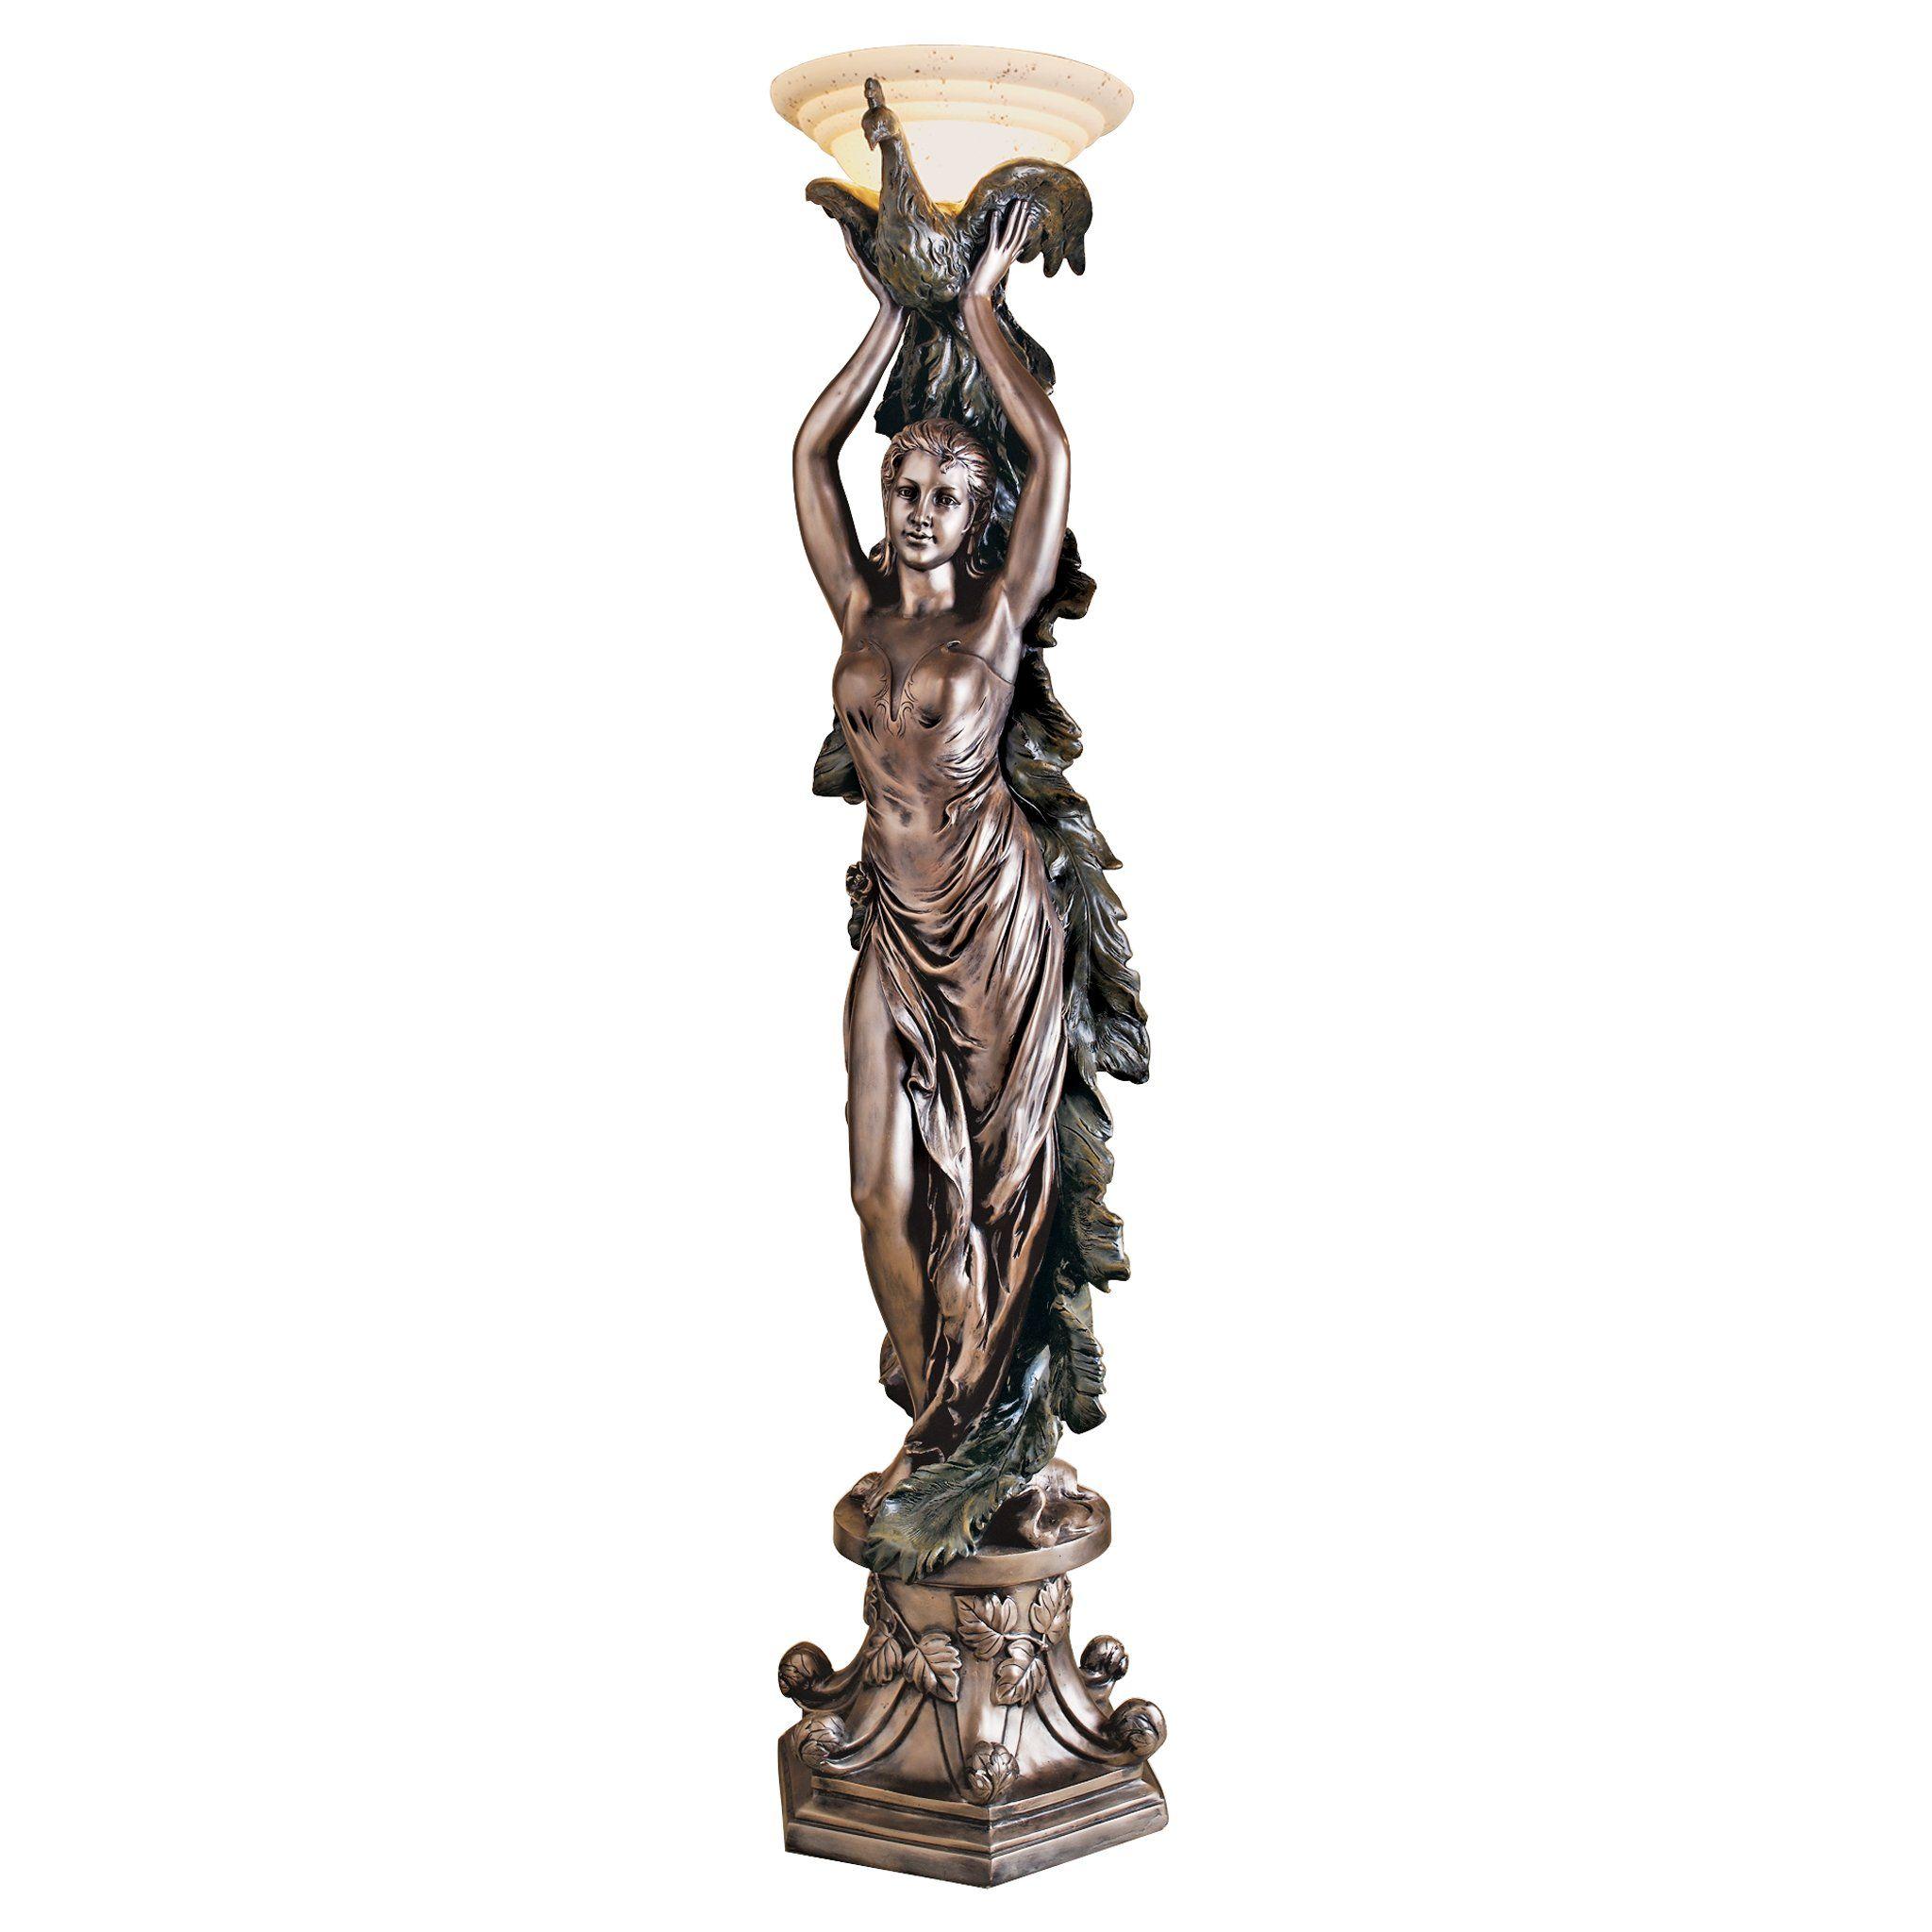 statue veneto lamp lamps antique htm studio oldworldlamps reliquary world old floor